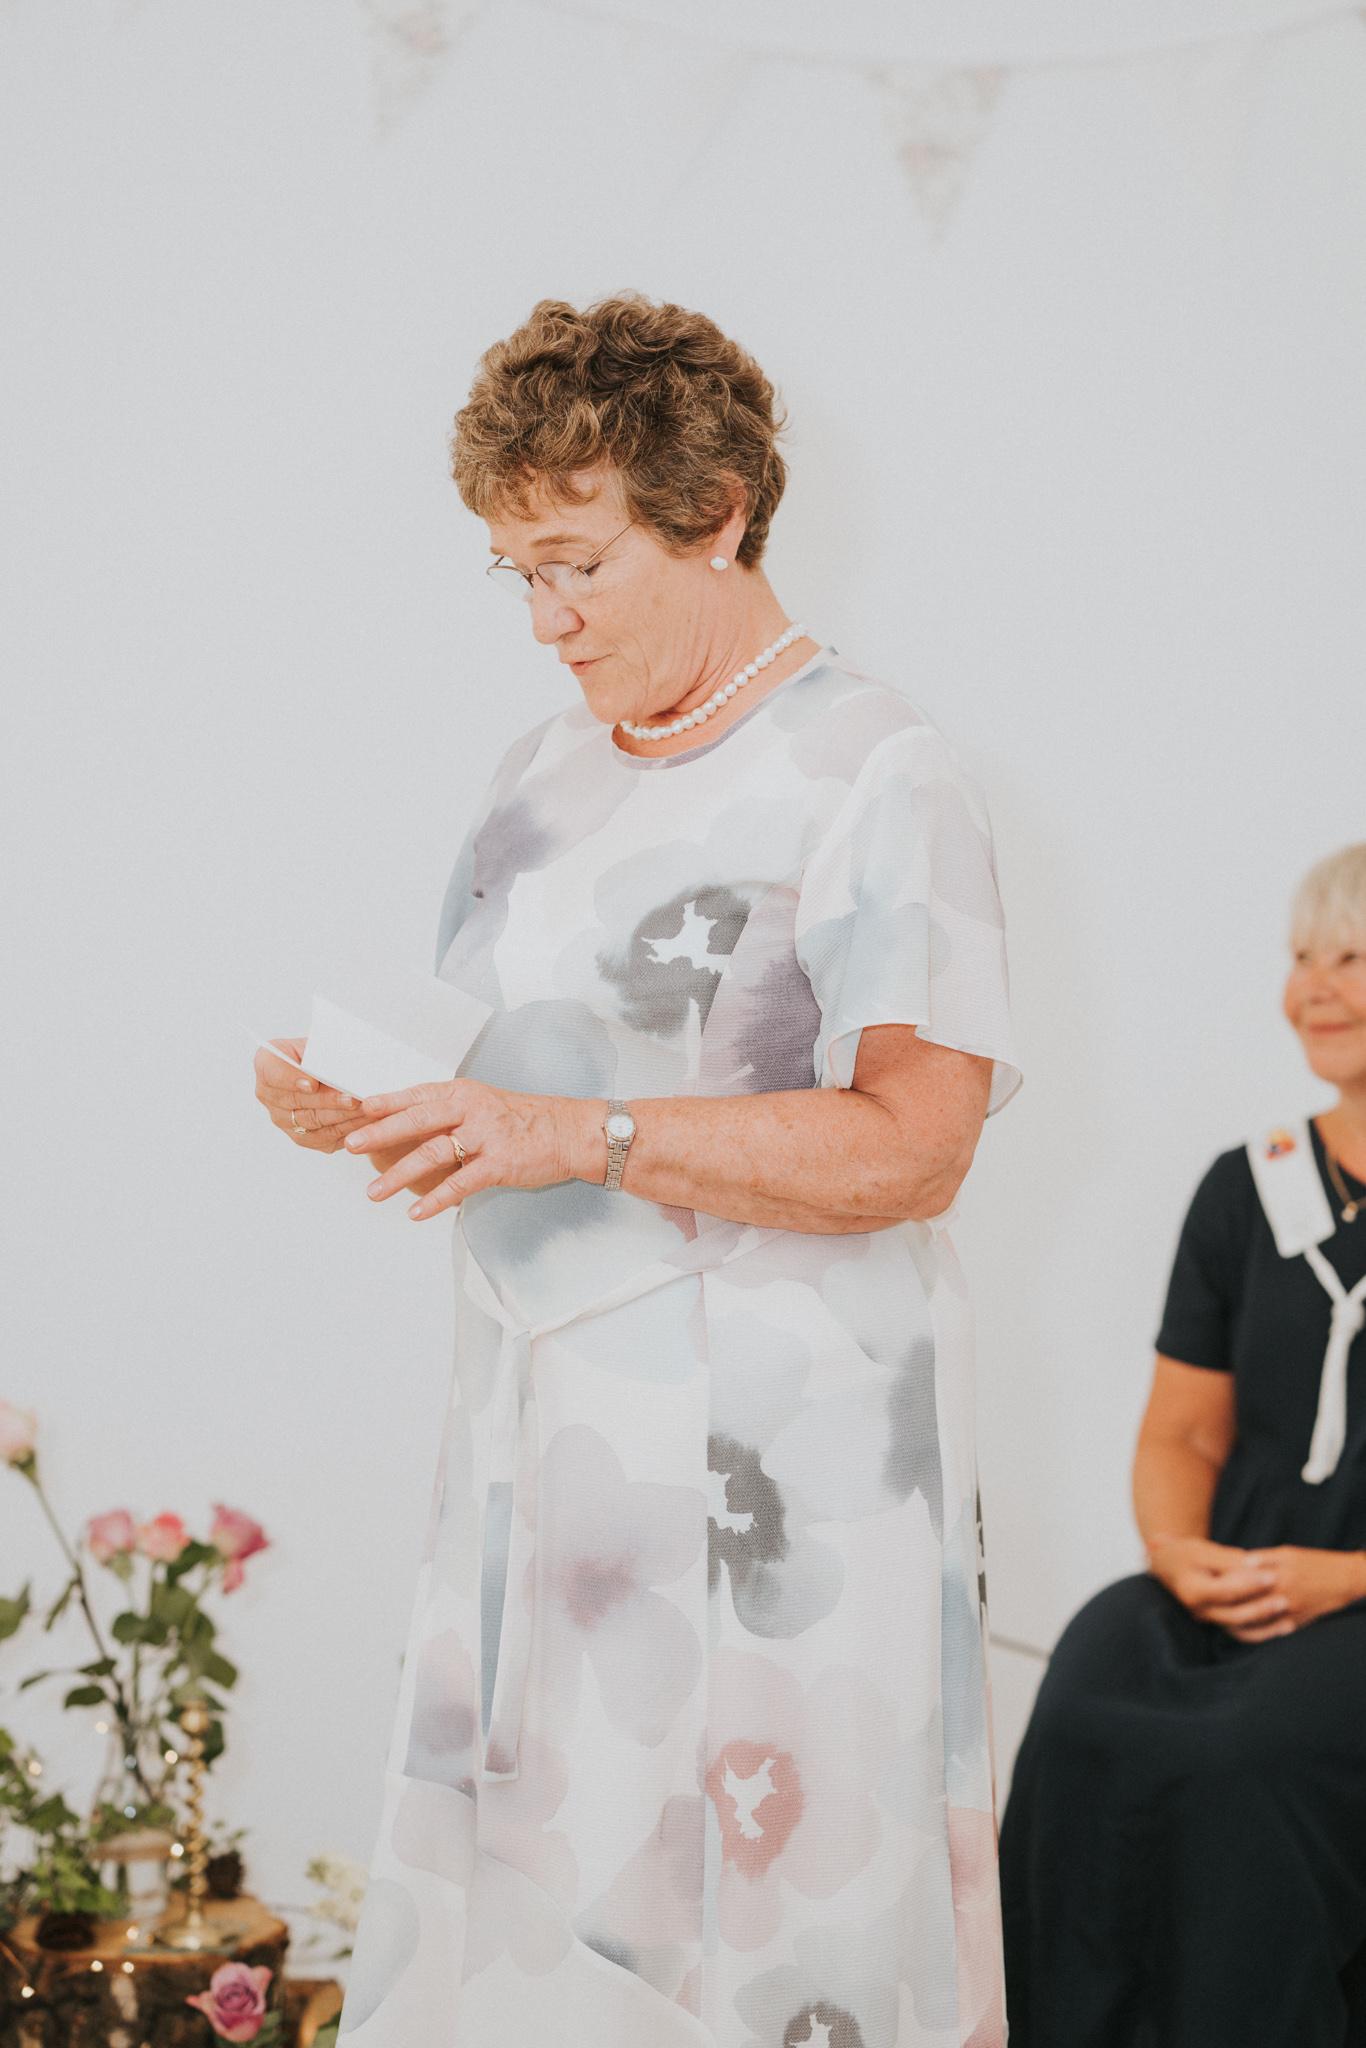 Grace-Elizabeth-Georgie-Amalaketu-Firstsite-Colchester-Essex-Boho-Buddhist-Wedding-Alternative-Wedding-Photography-Essex (49 of 100).jpg